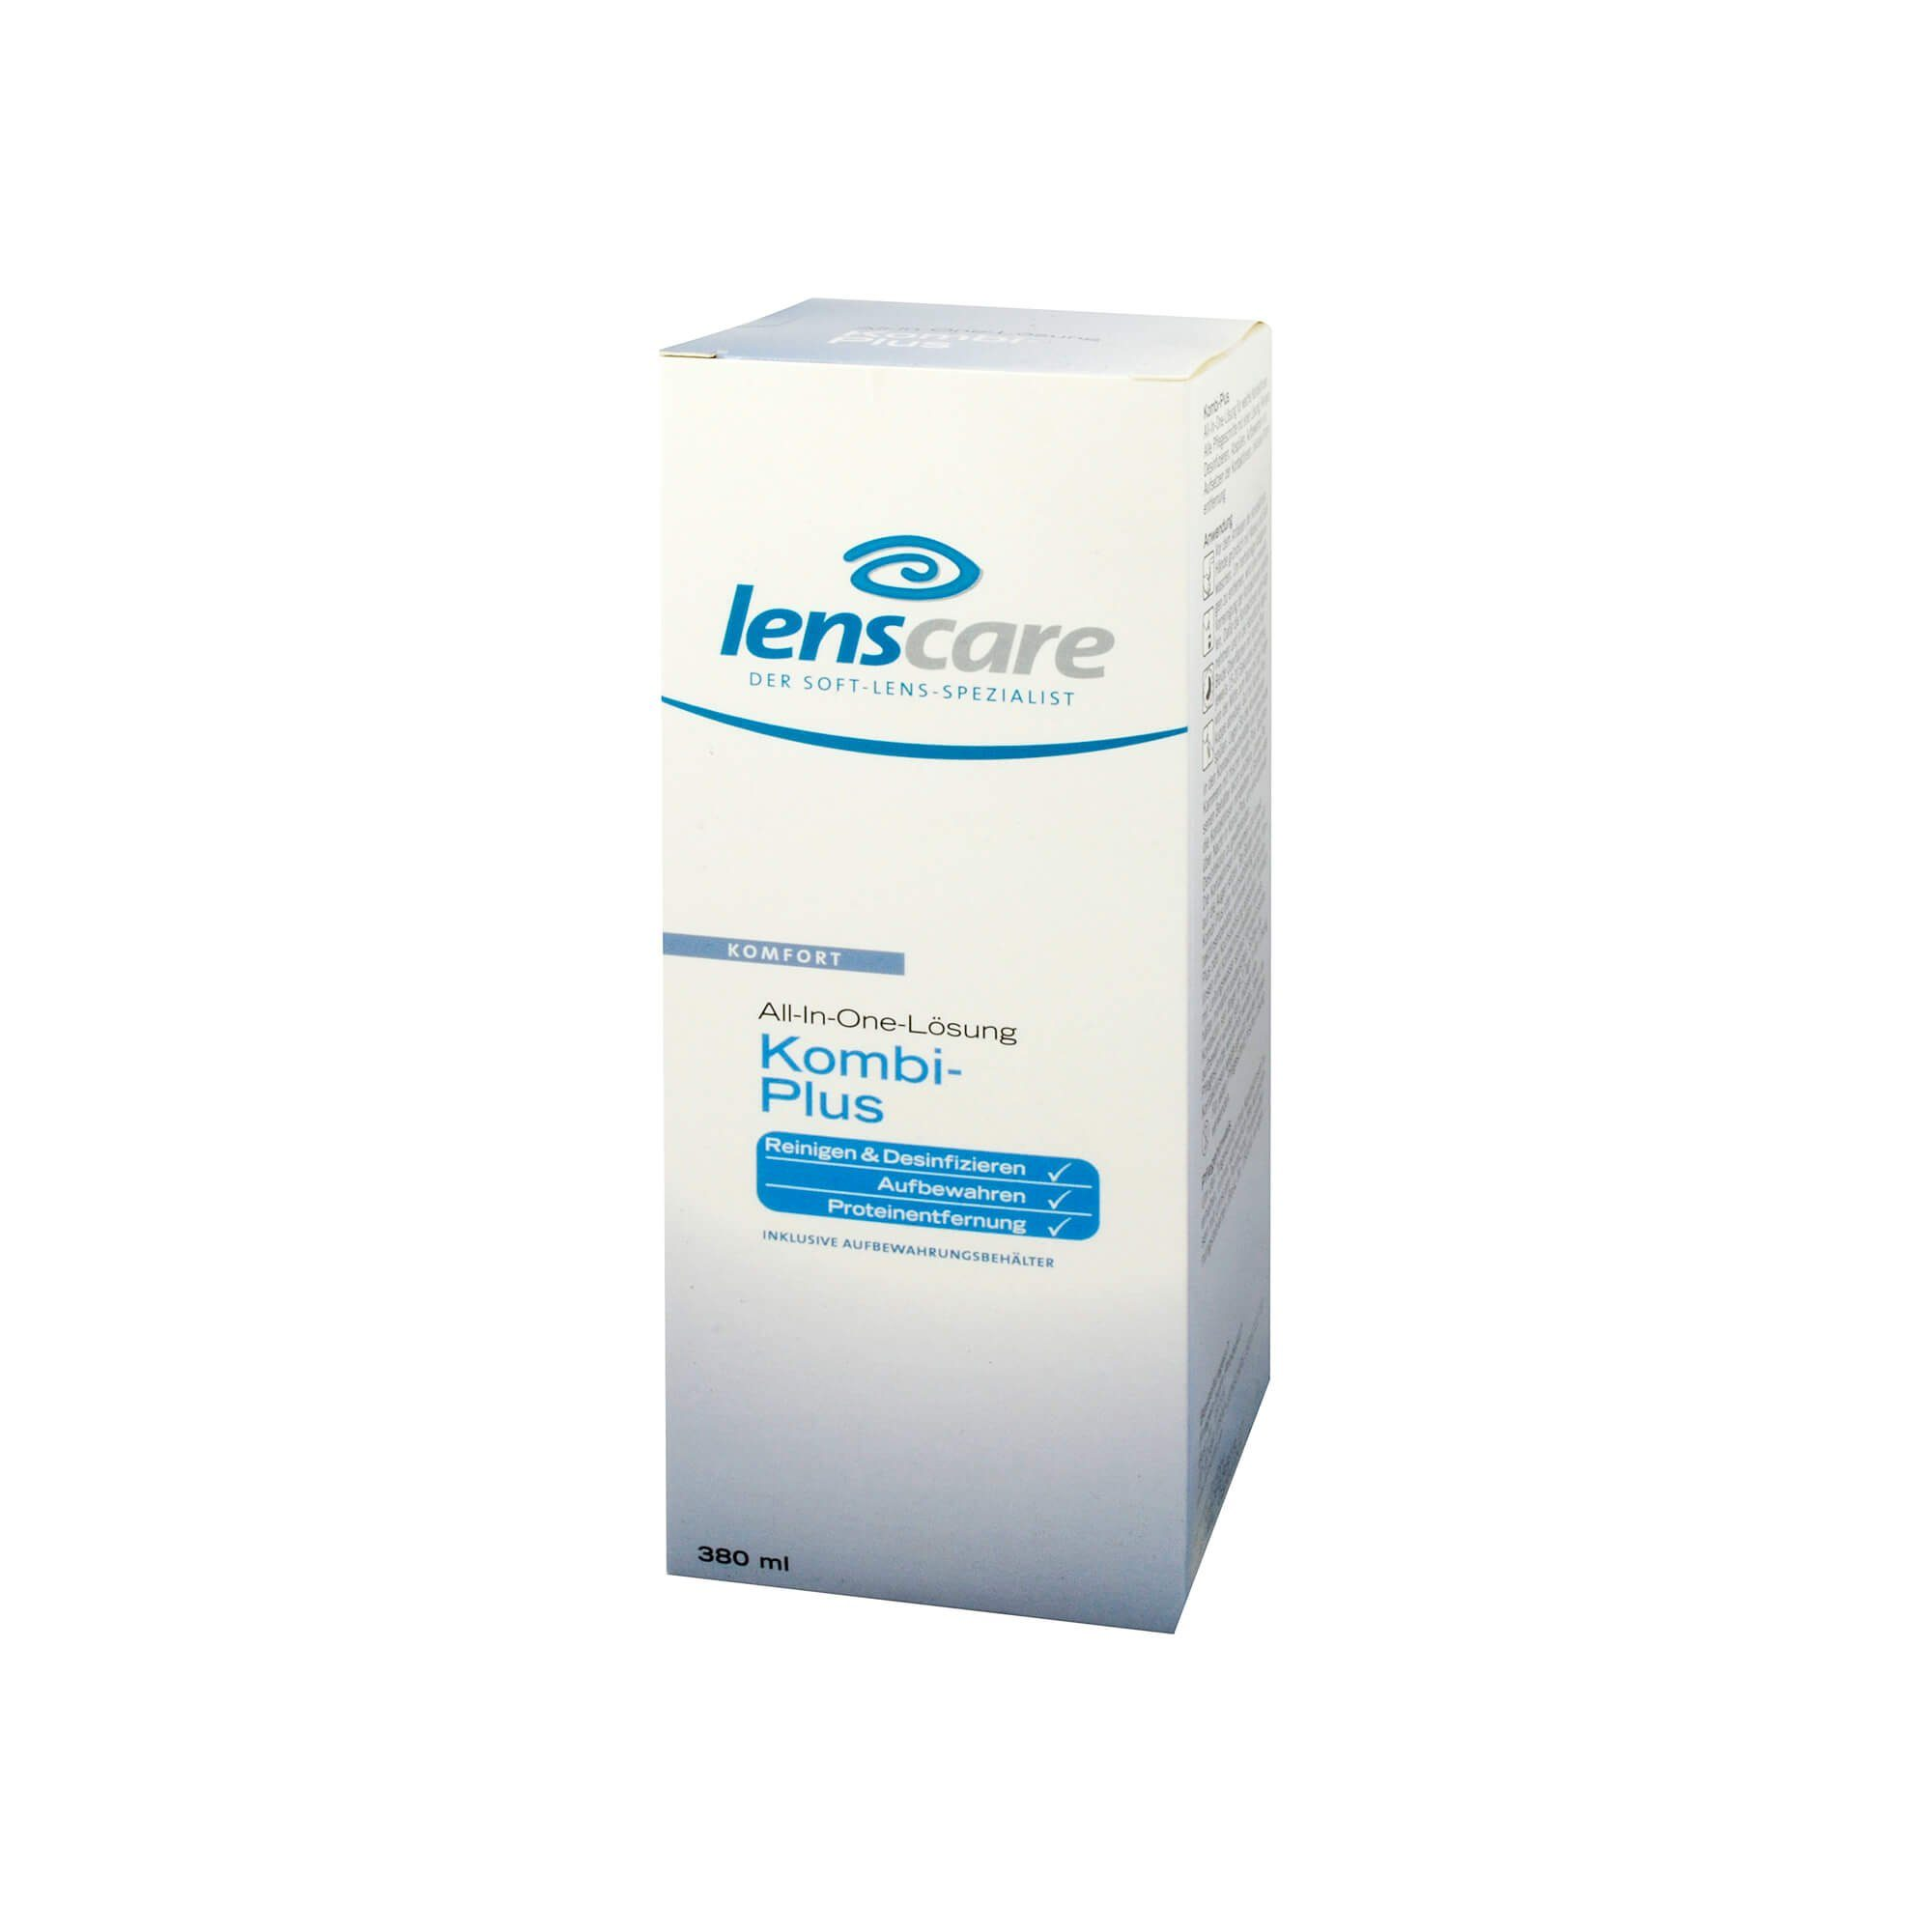 Lenscare Kombi Plus Lösung, 380 ml